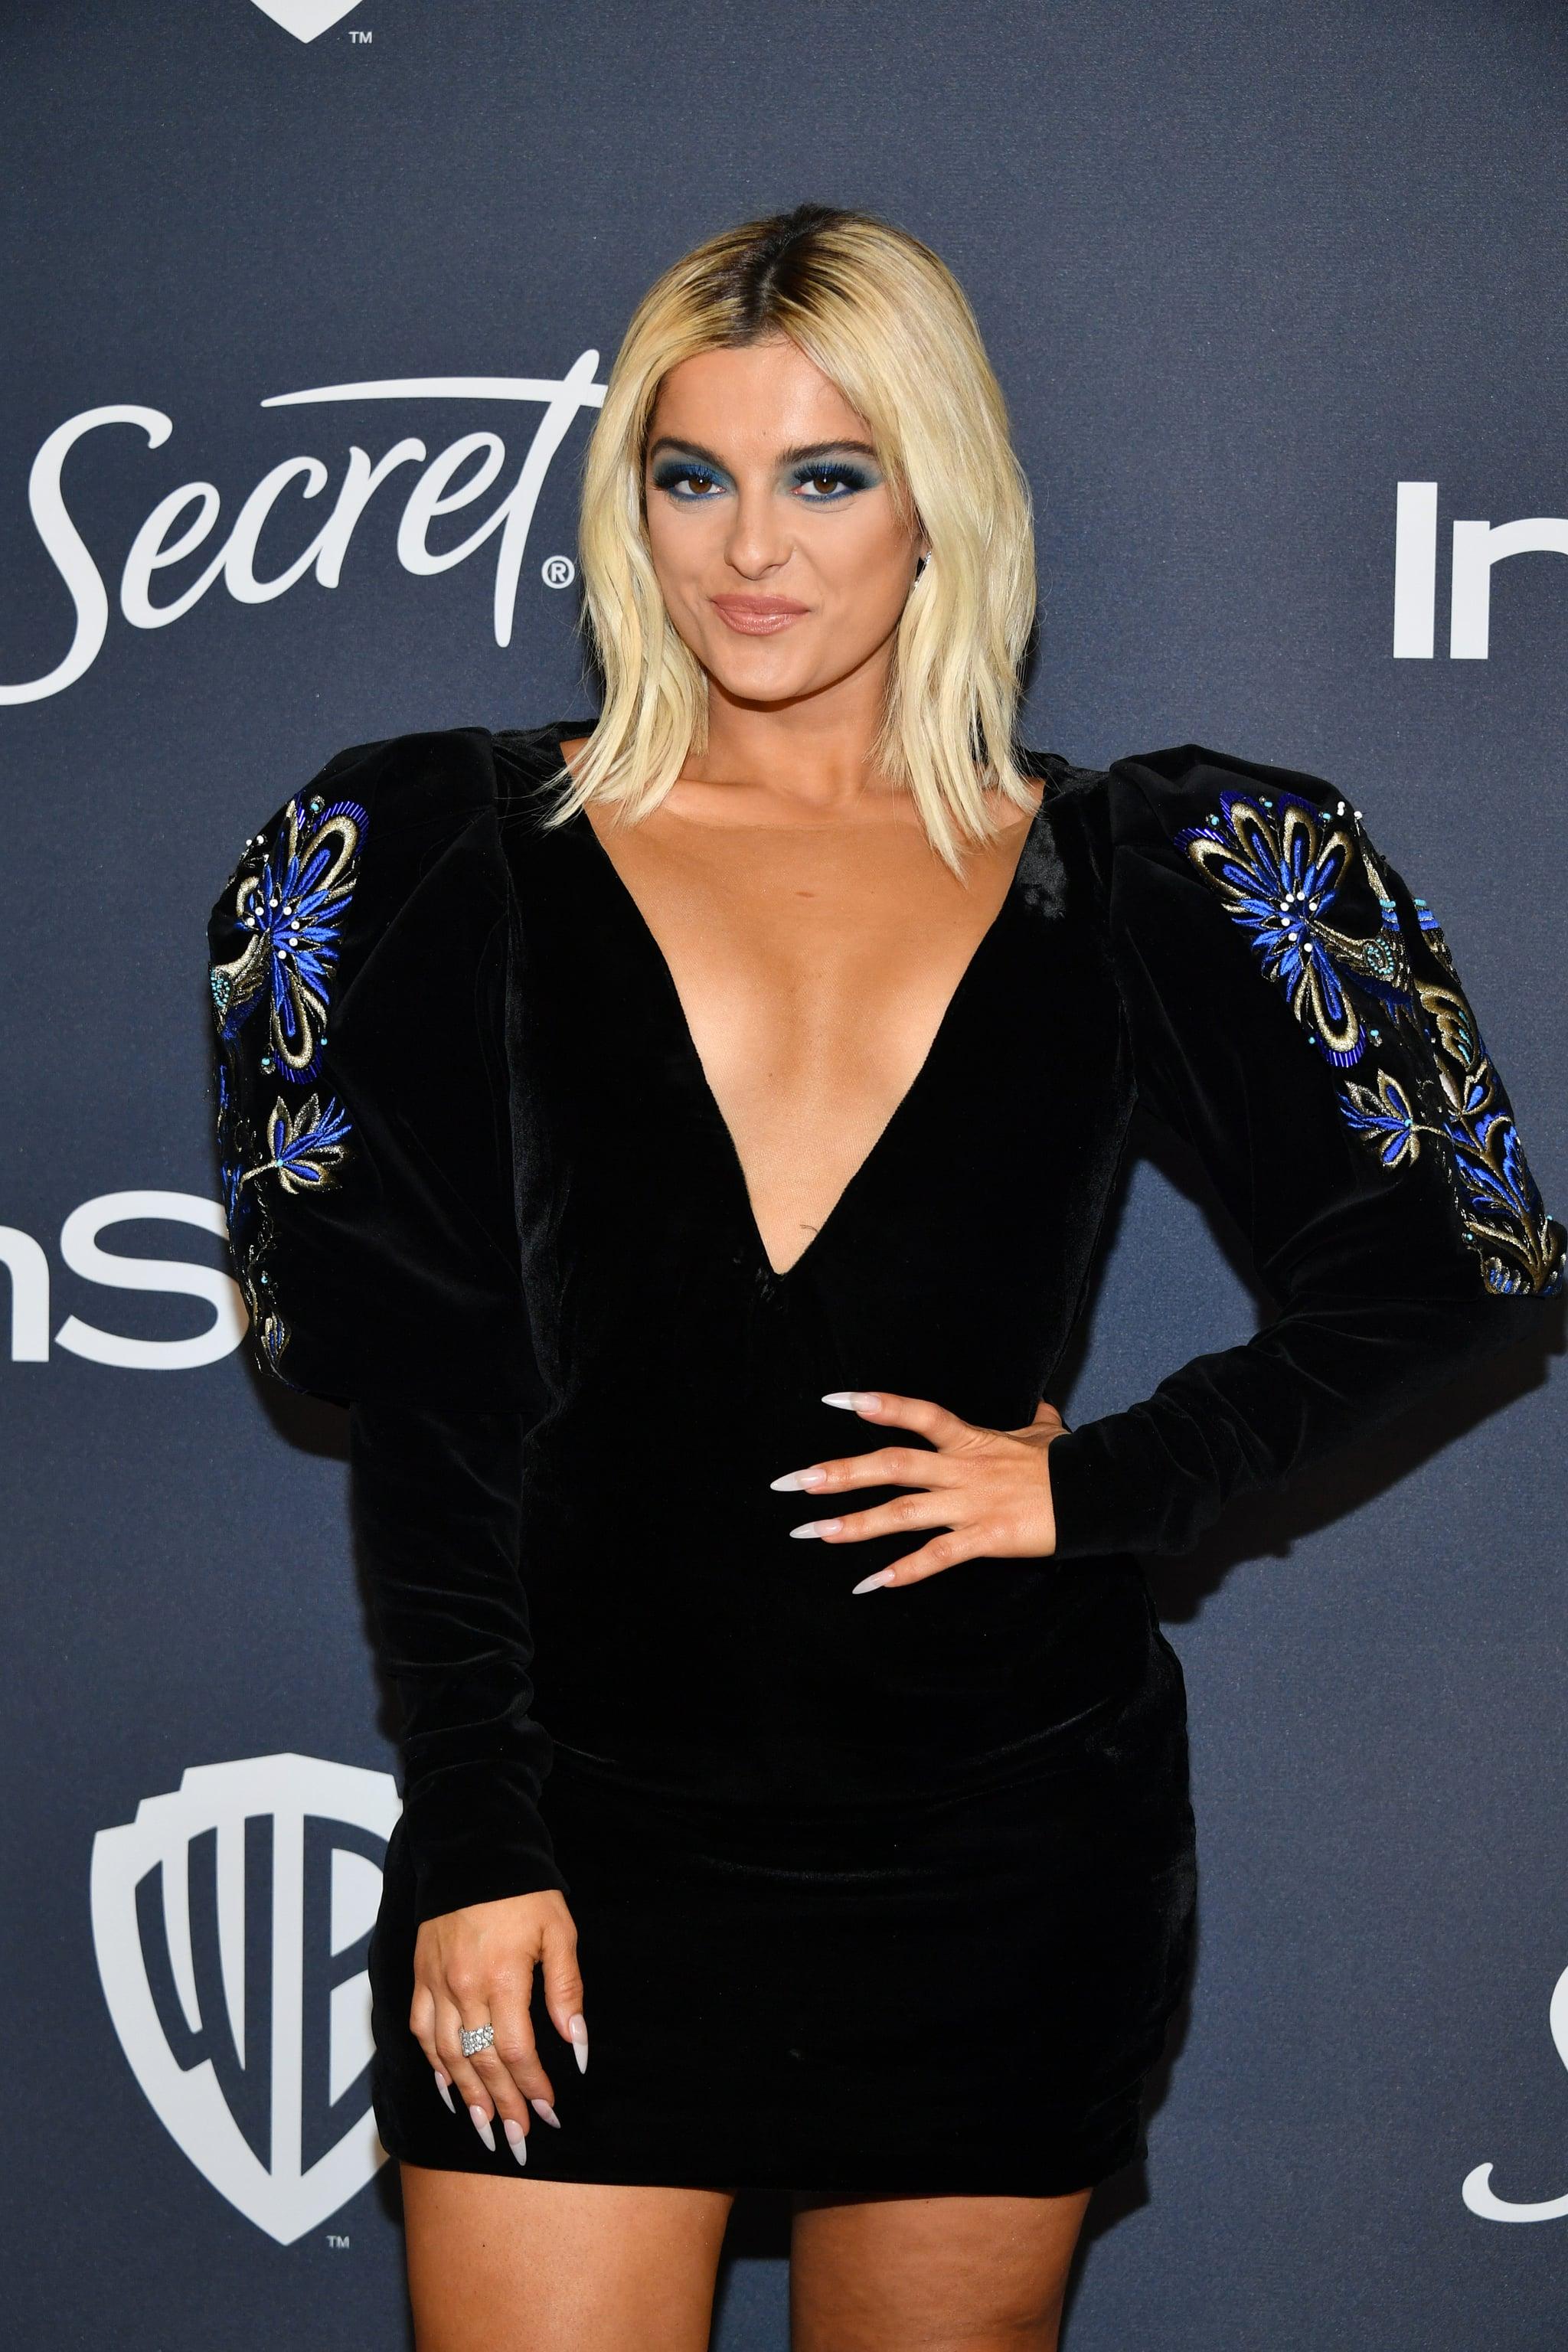 Hot single female celebrities 2017